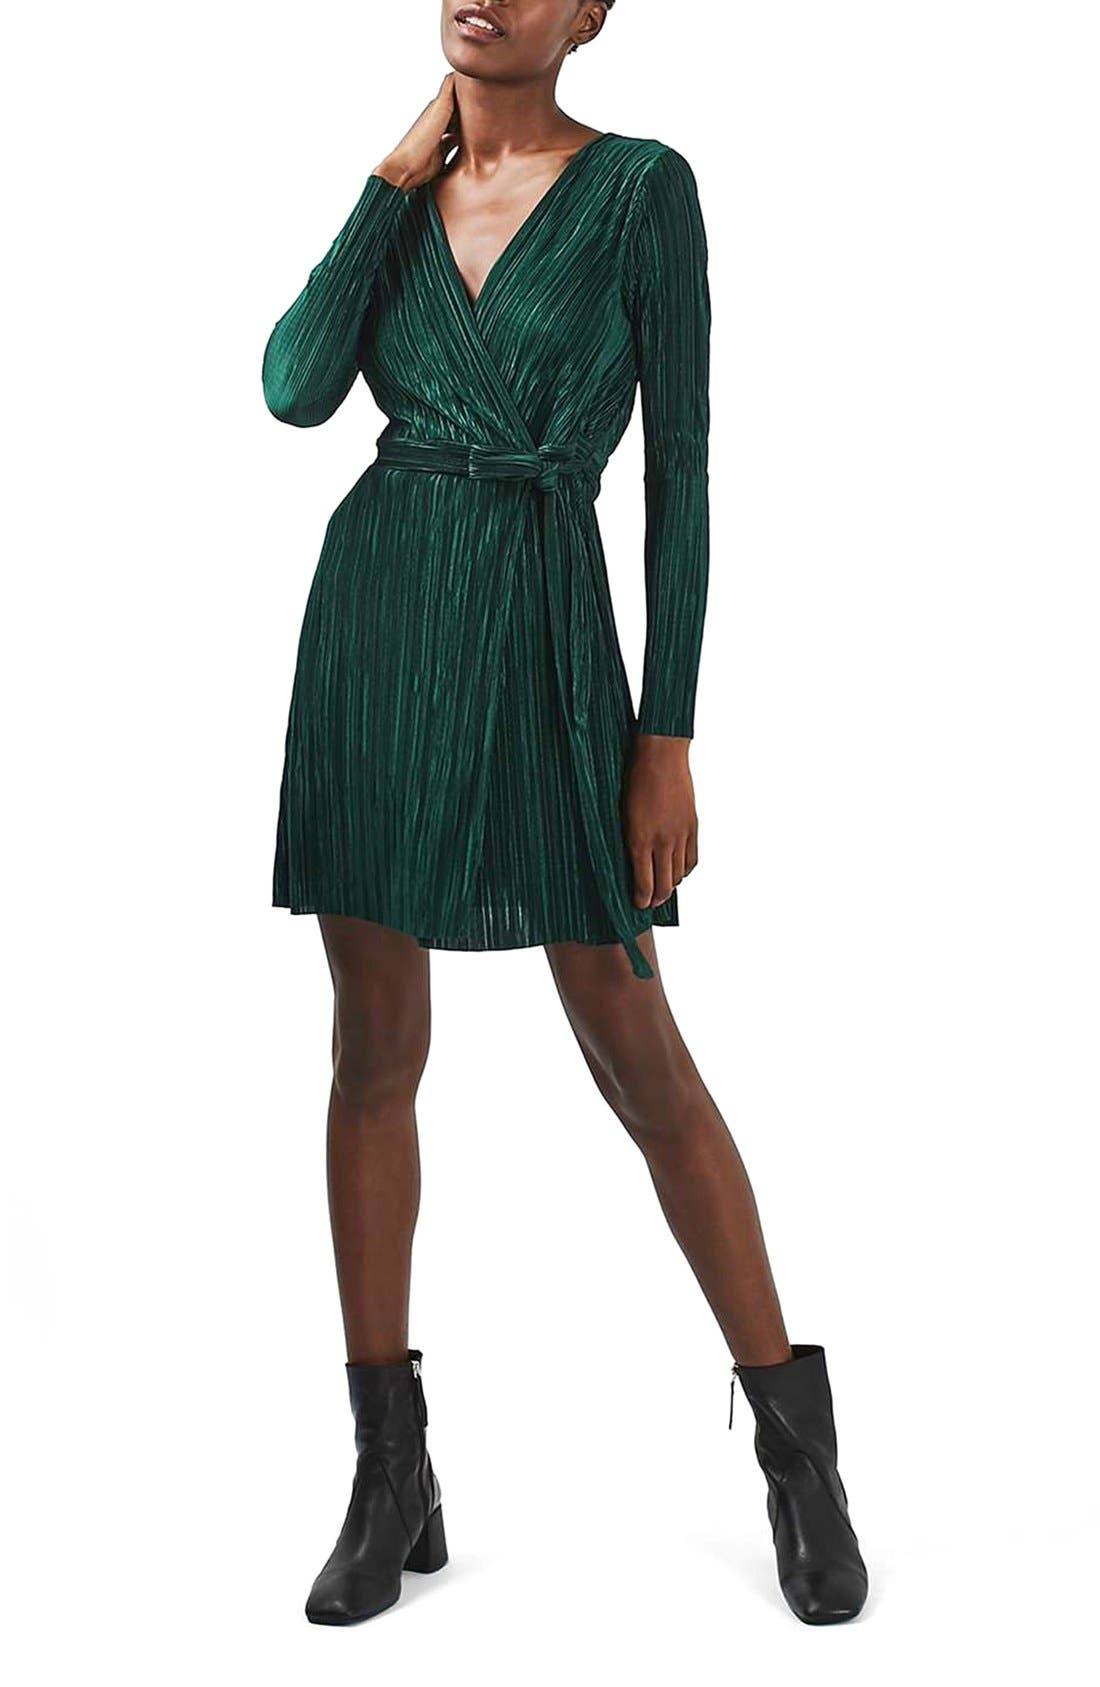 Alternate Image 1 Selected - Topshop Plissé Wrap Minidress (Regular & Petite)